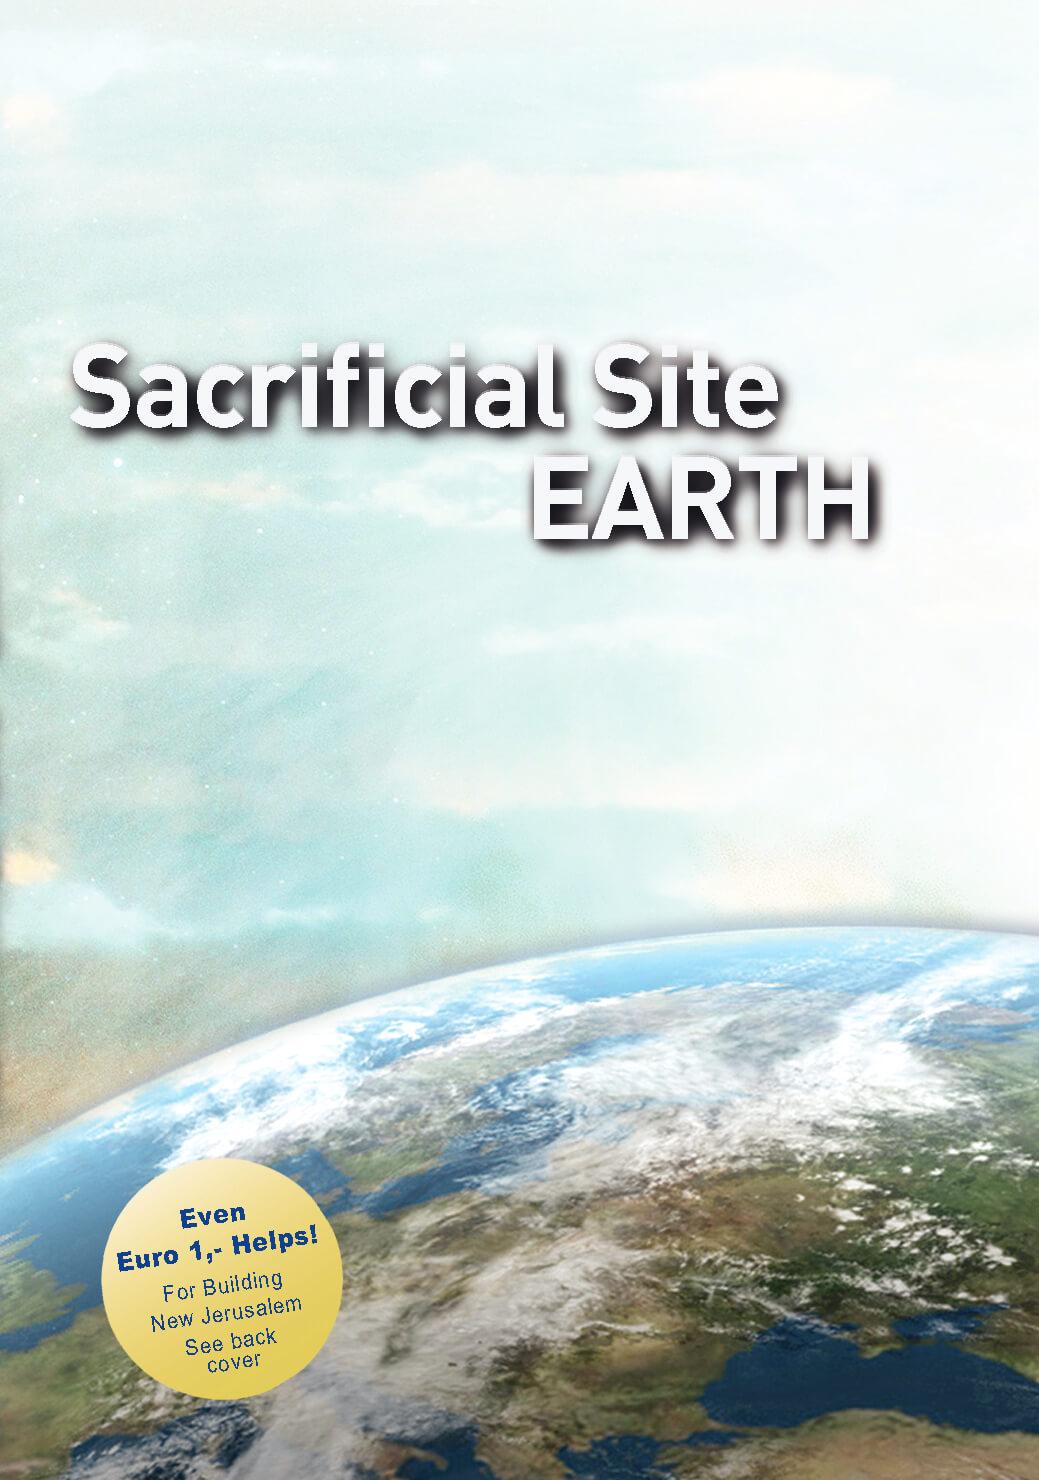 Sacrificial Site EARTH